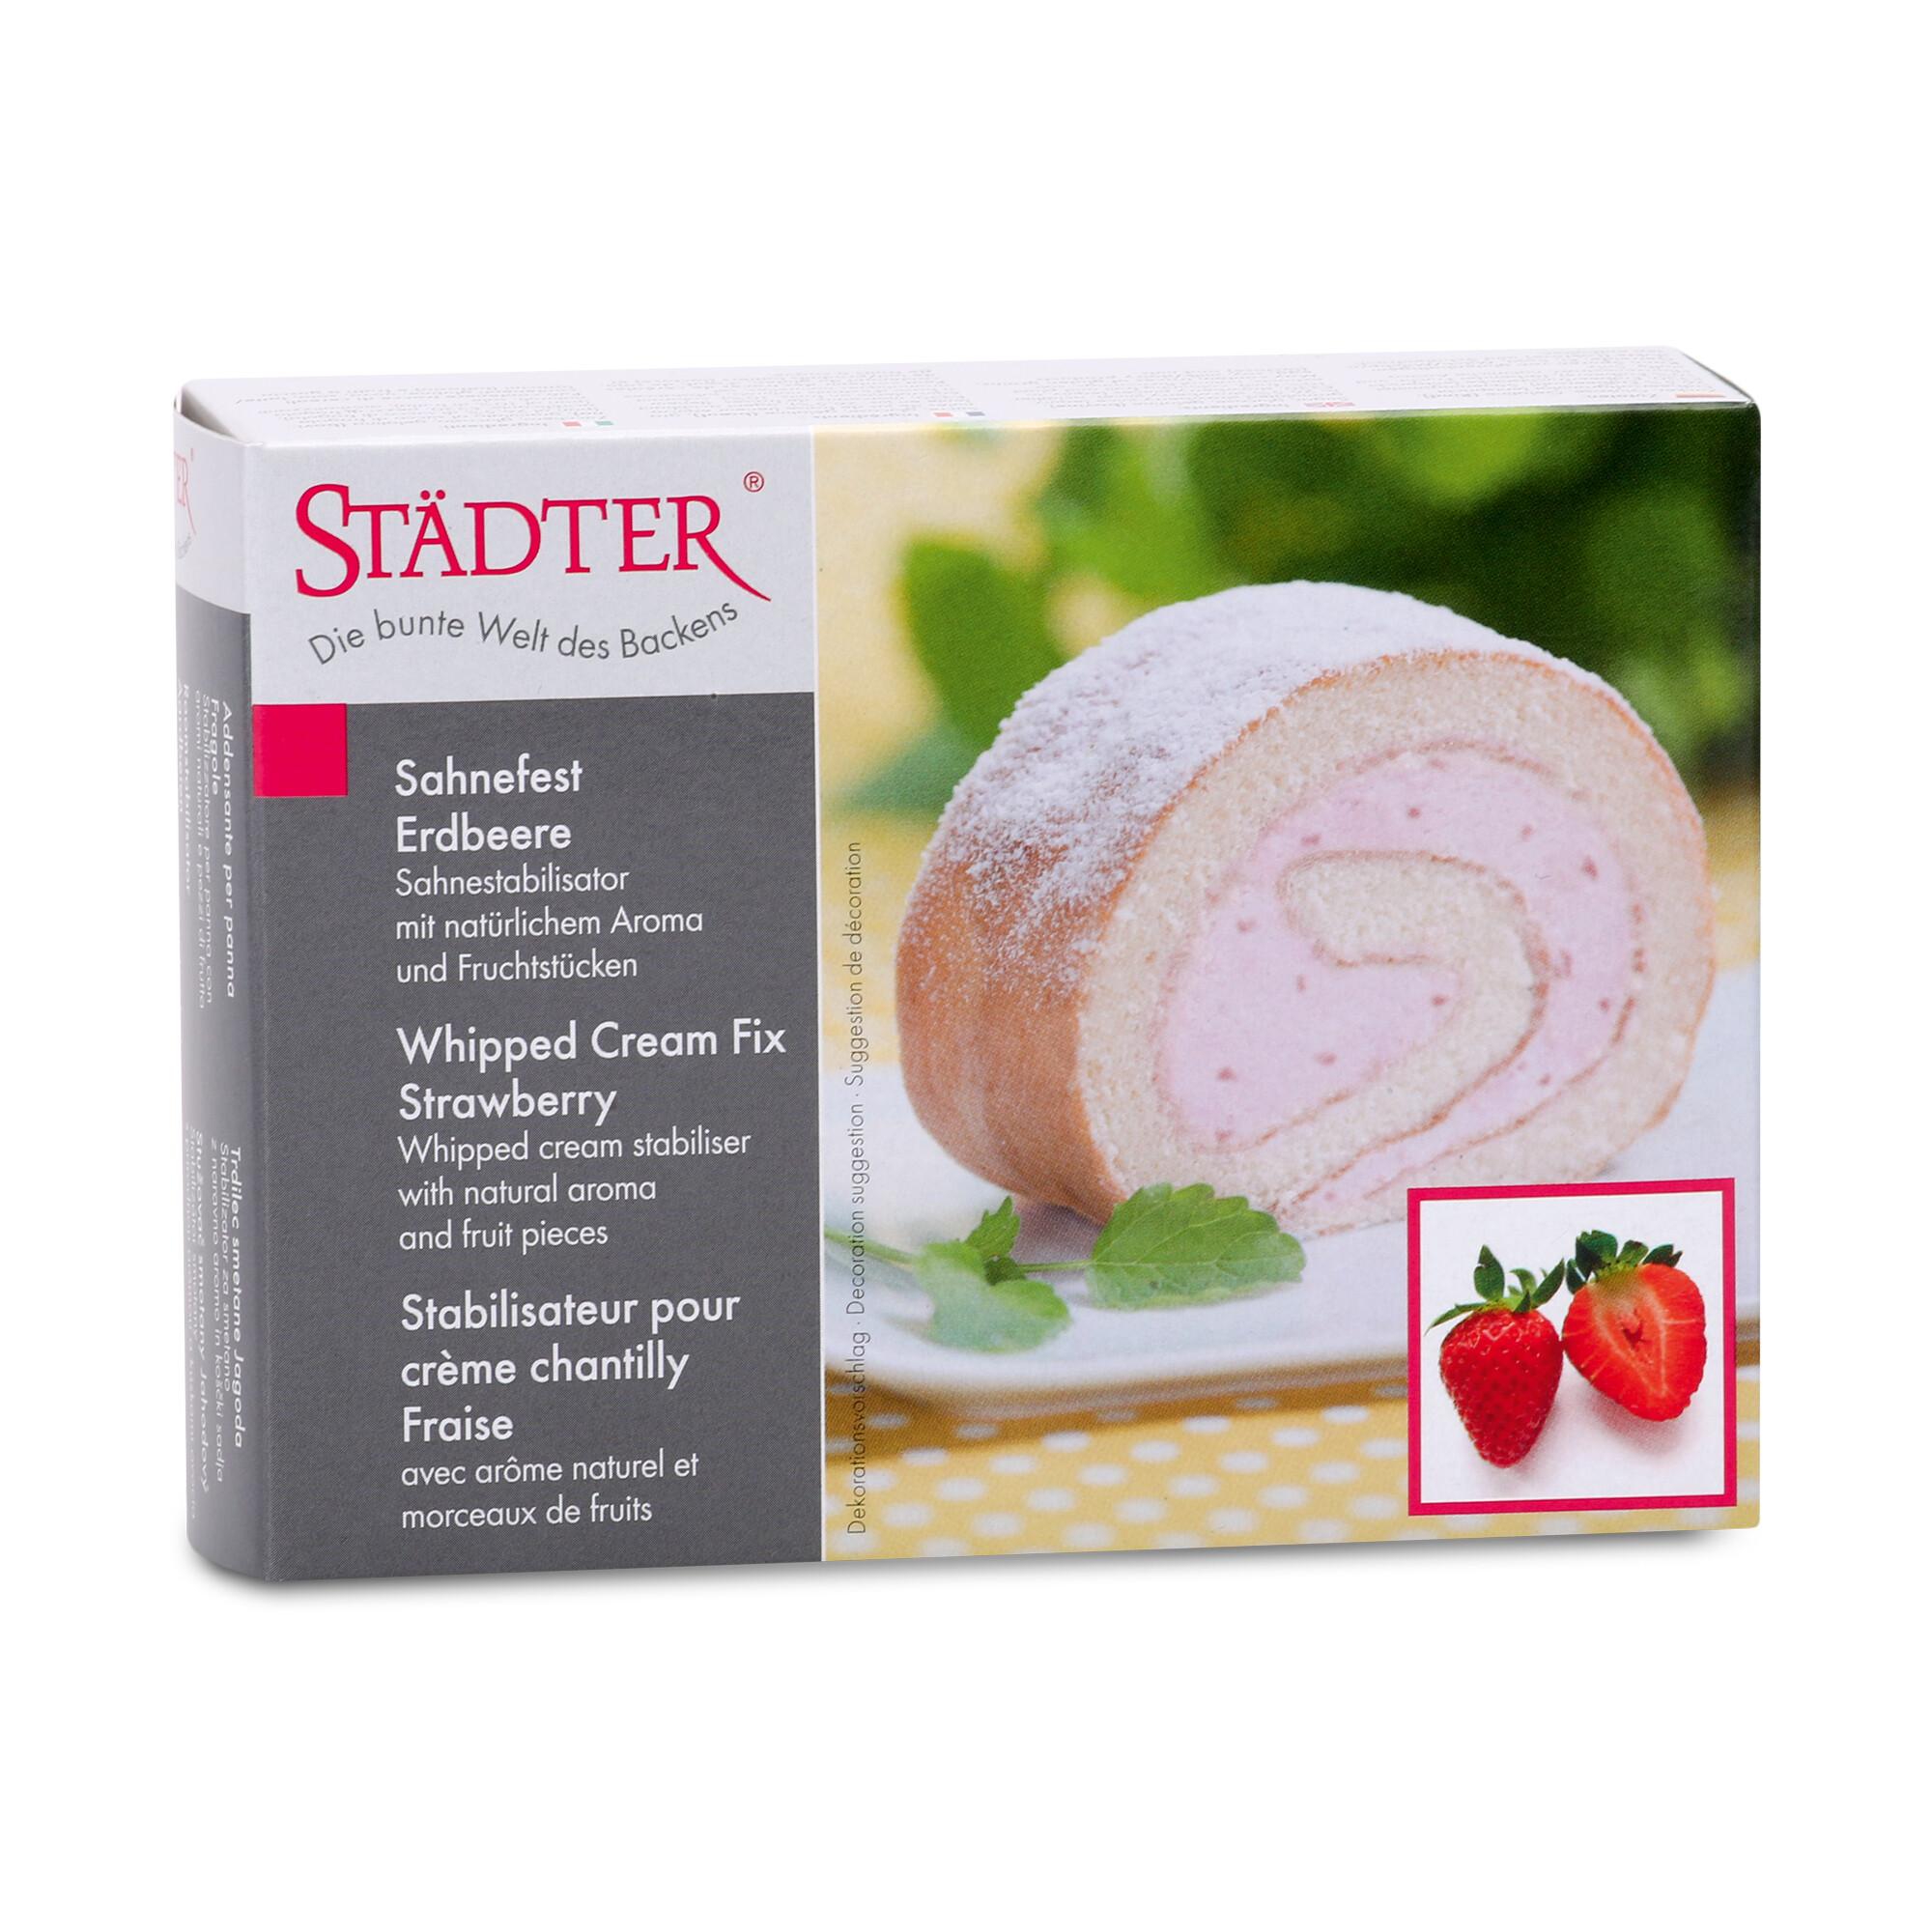 Whipped cream fix - Strawberry